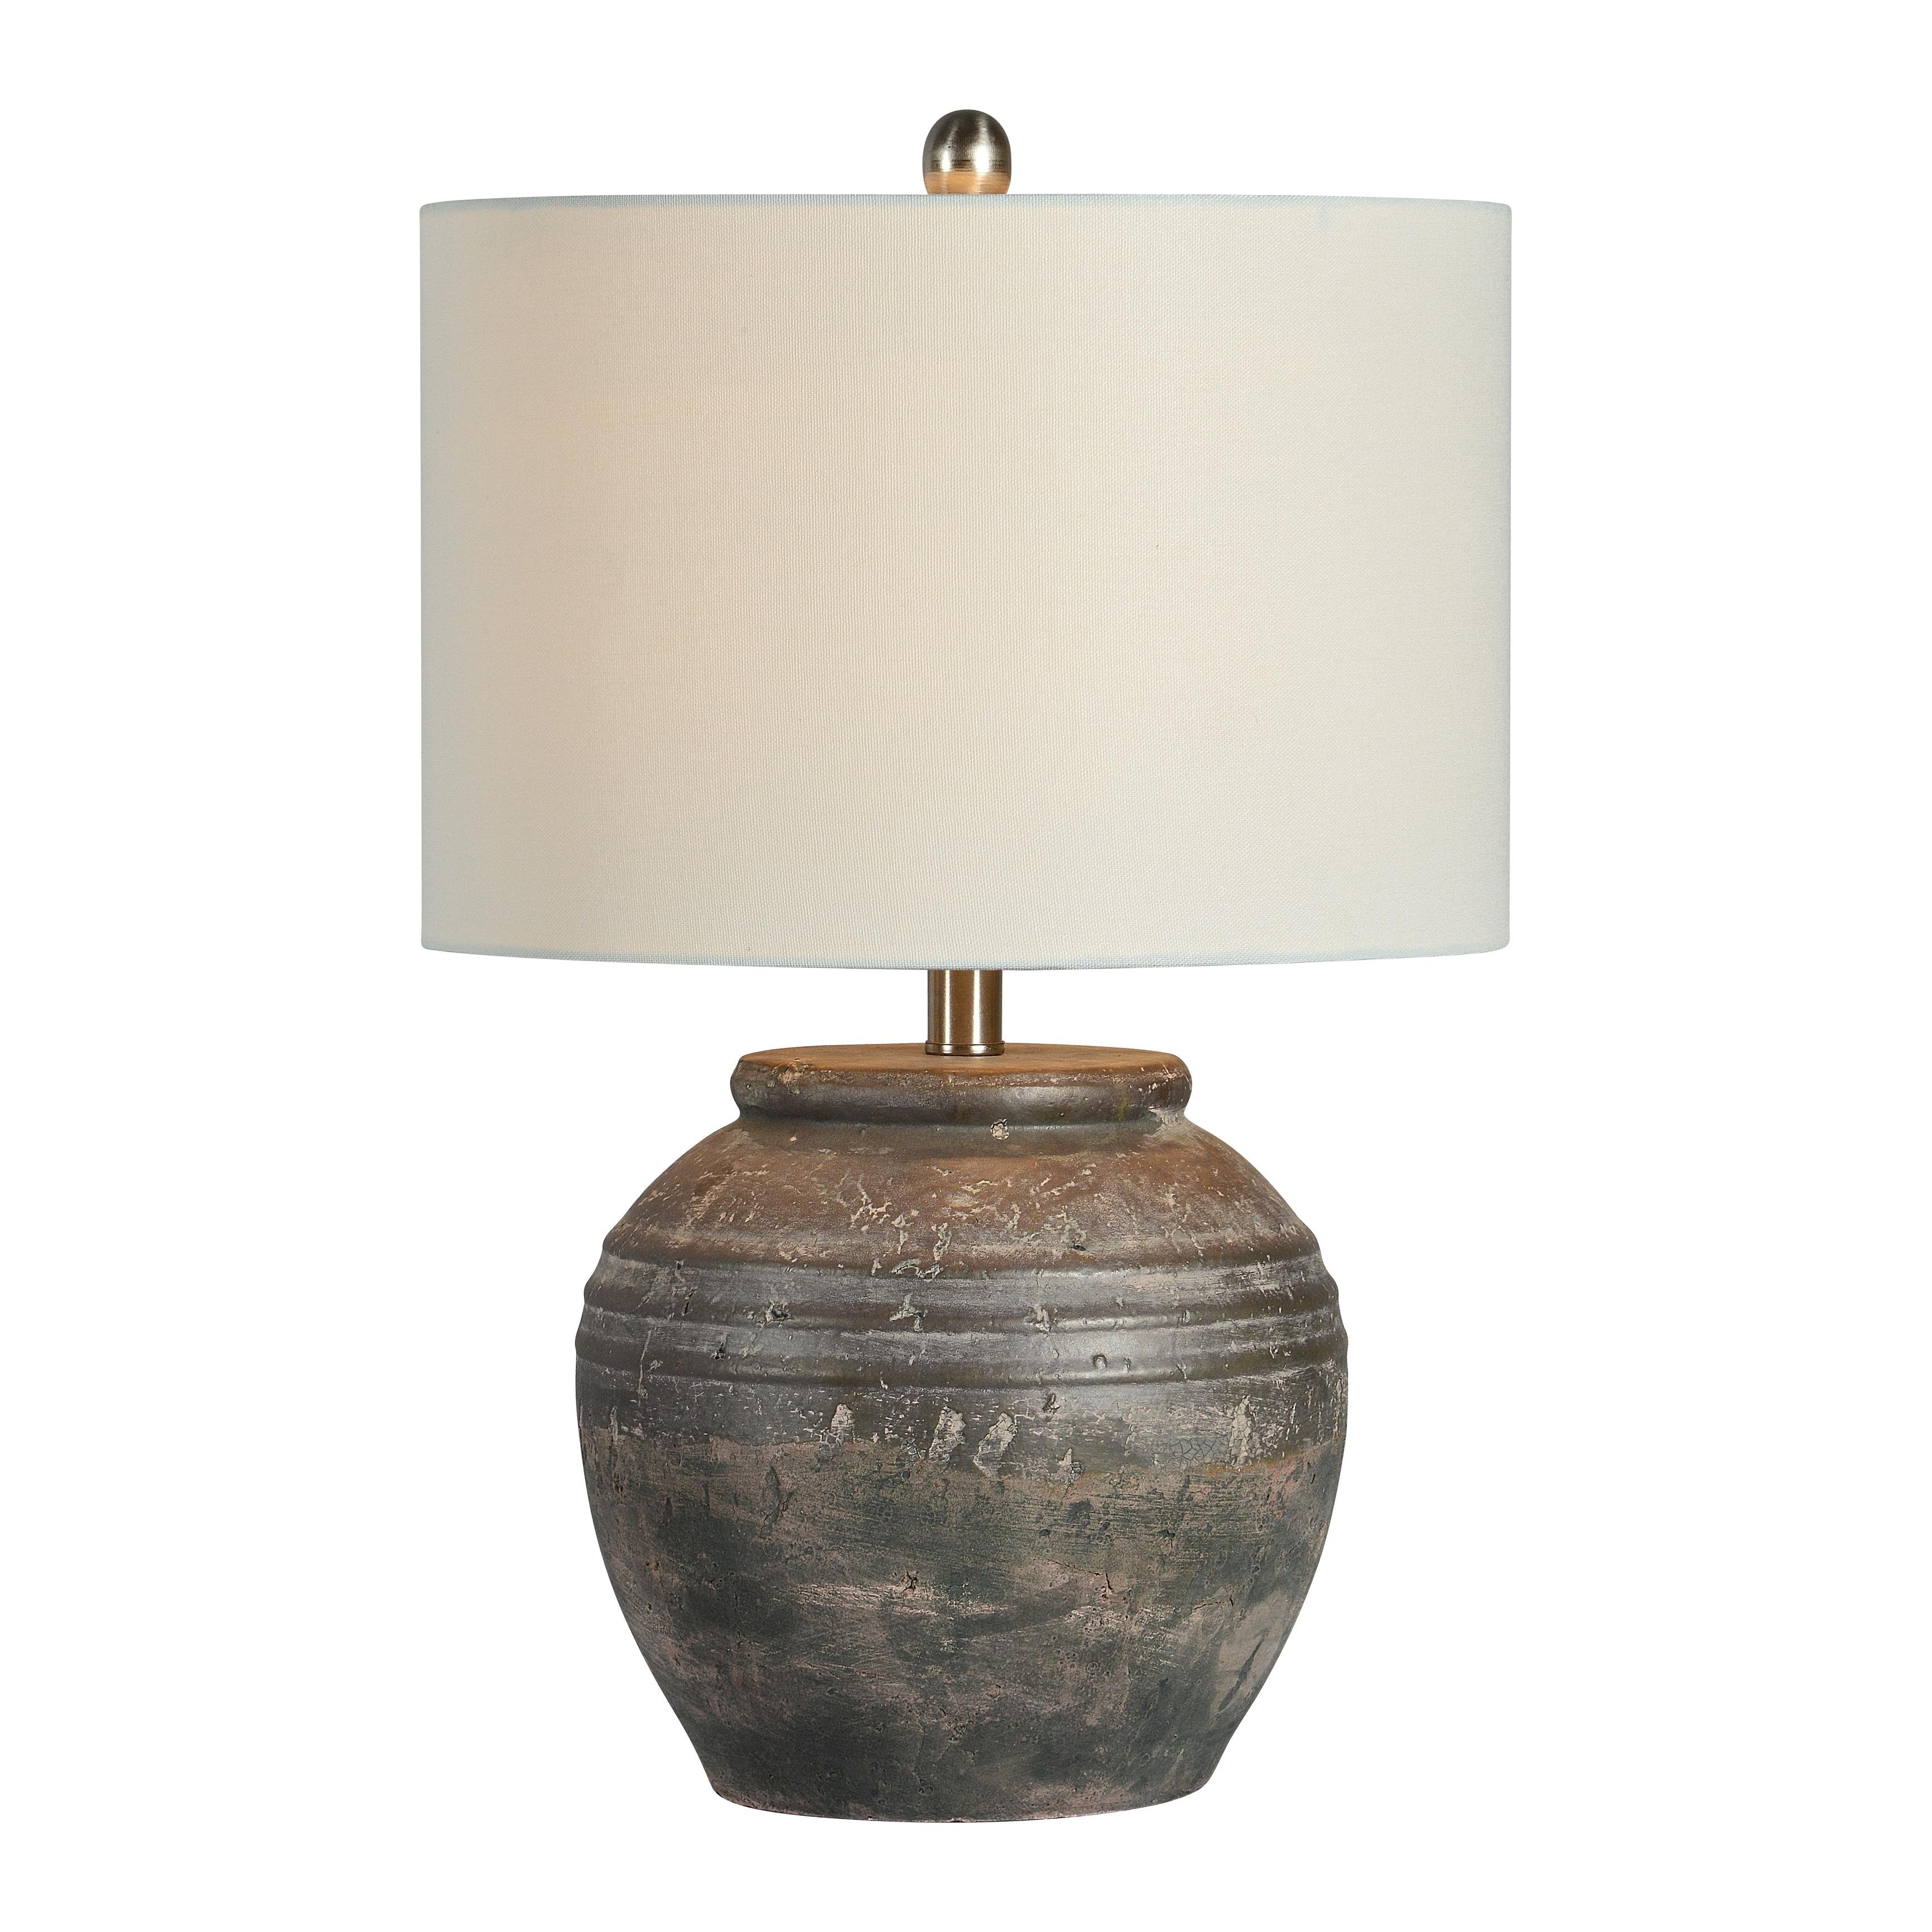 Douglas Table Lamp 22 Overstock 31723724